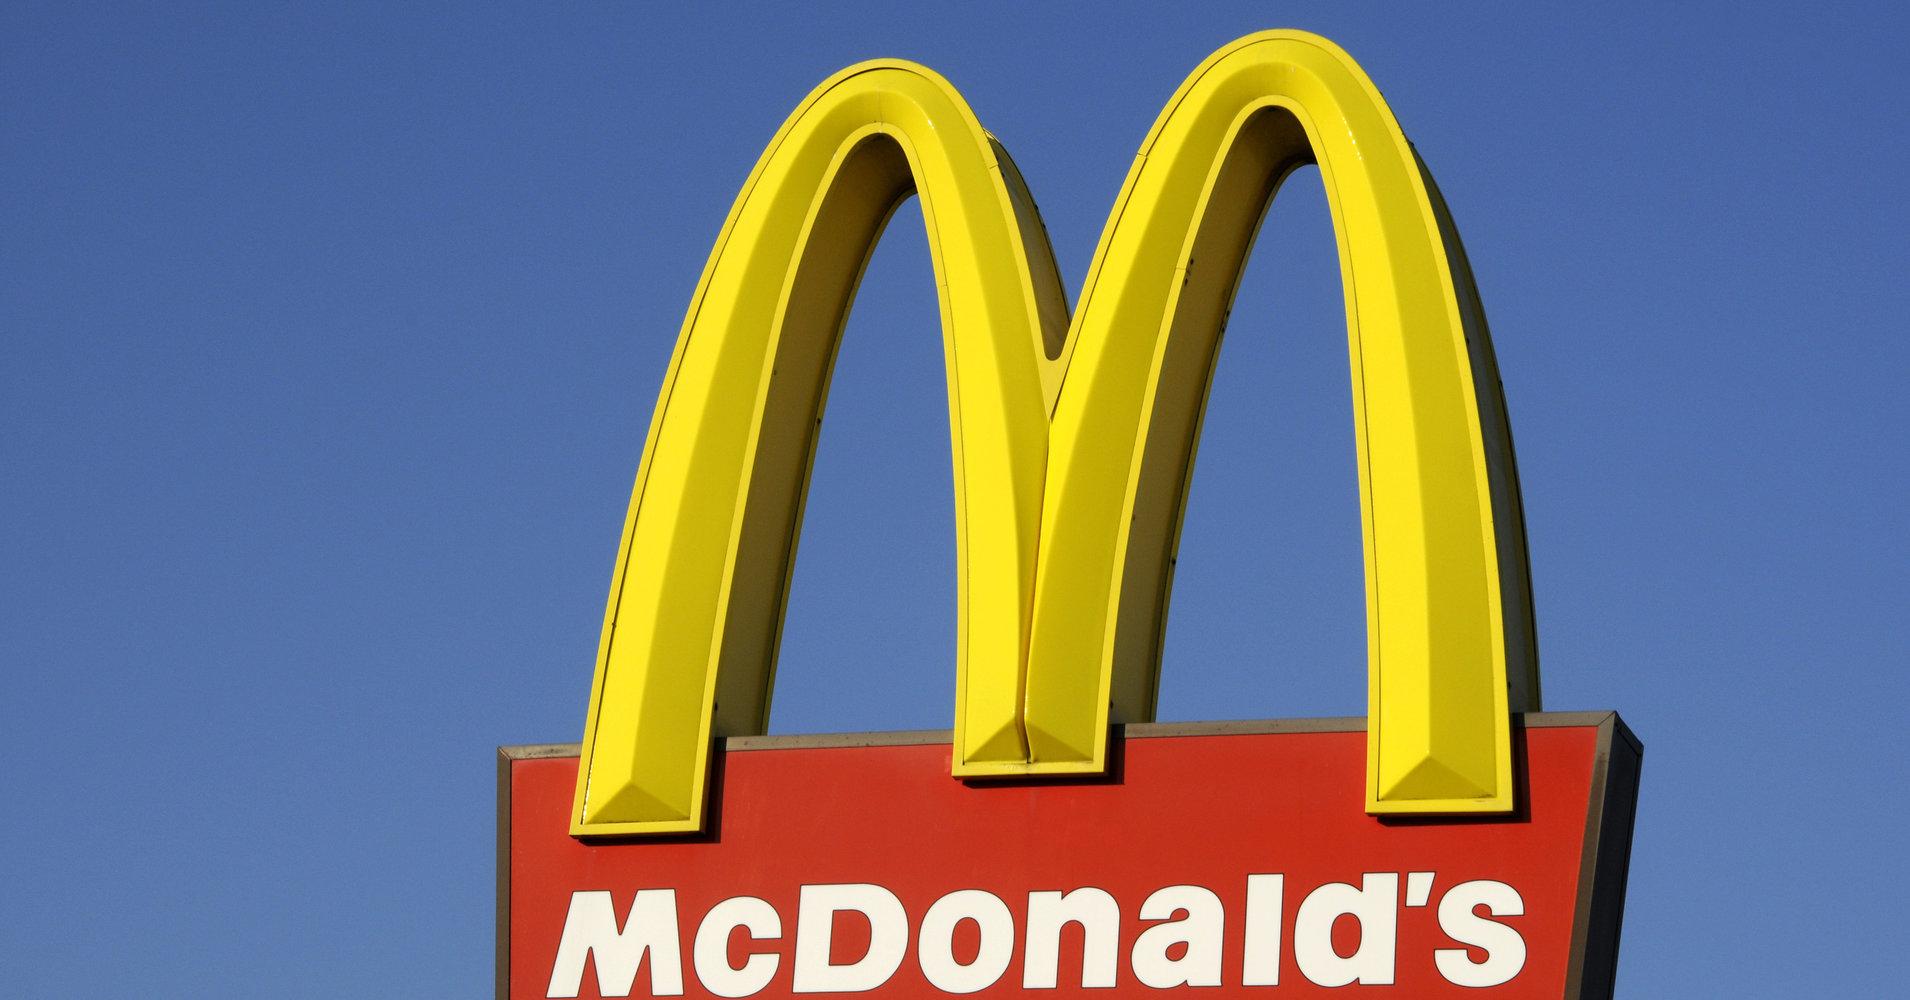 McDonald's Fast Food Restaurant